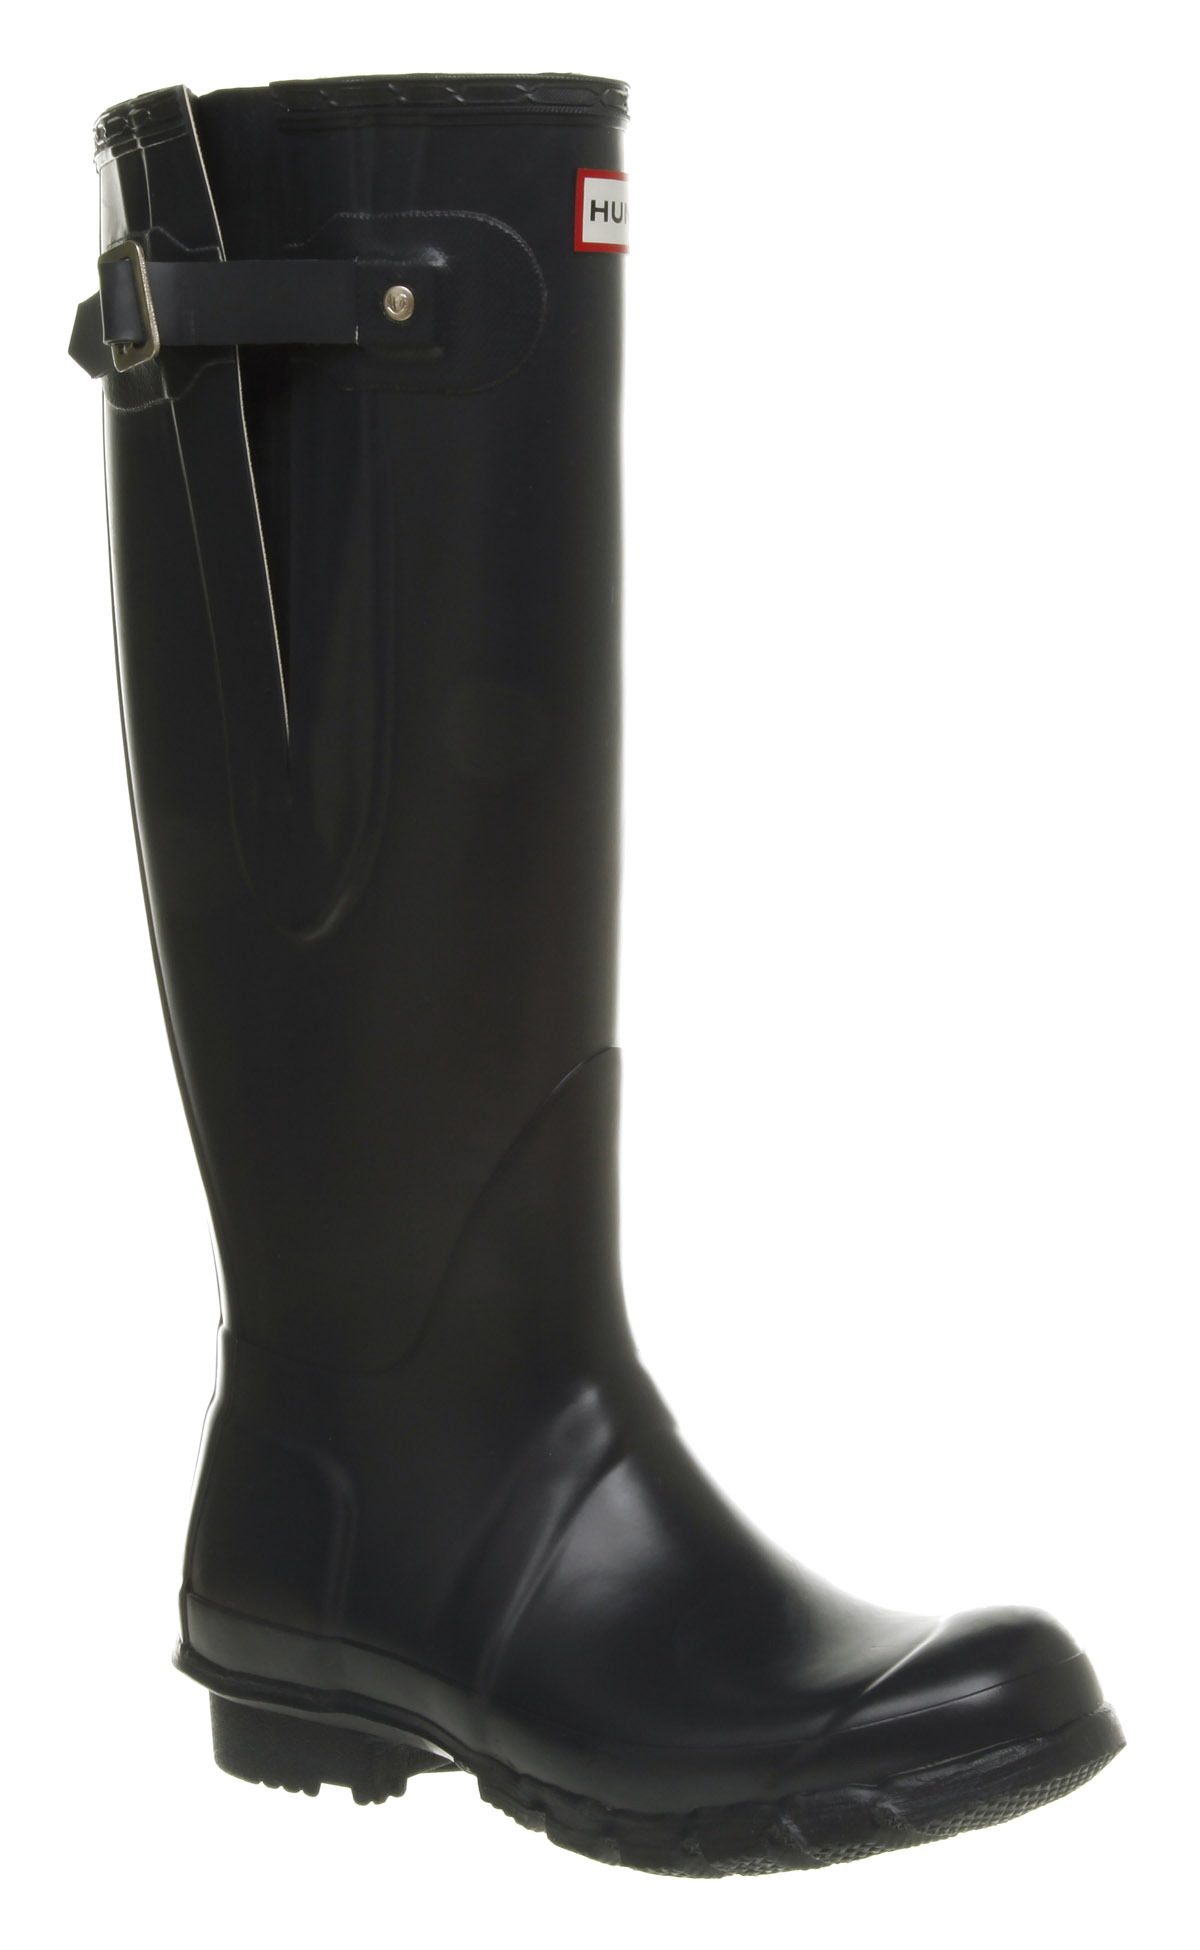 Womens-Hunter-Original-Adjustable-Blue-Boots-Shoes-New